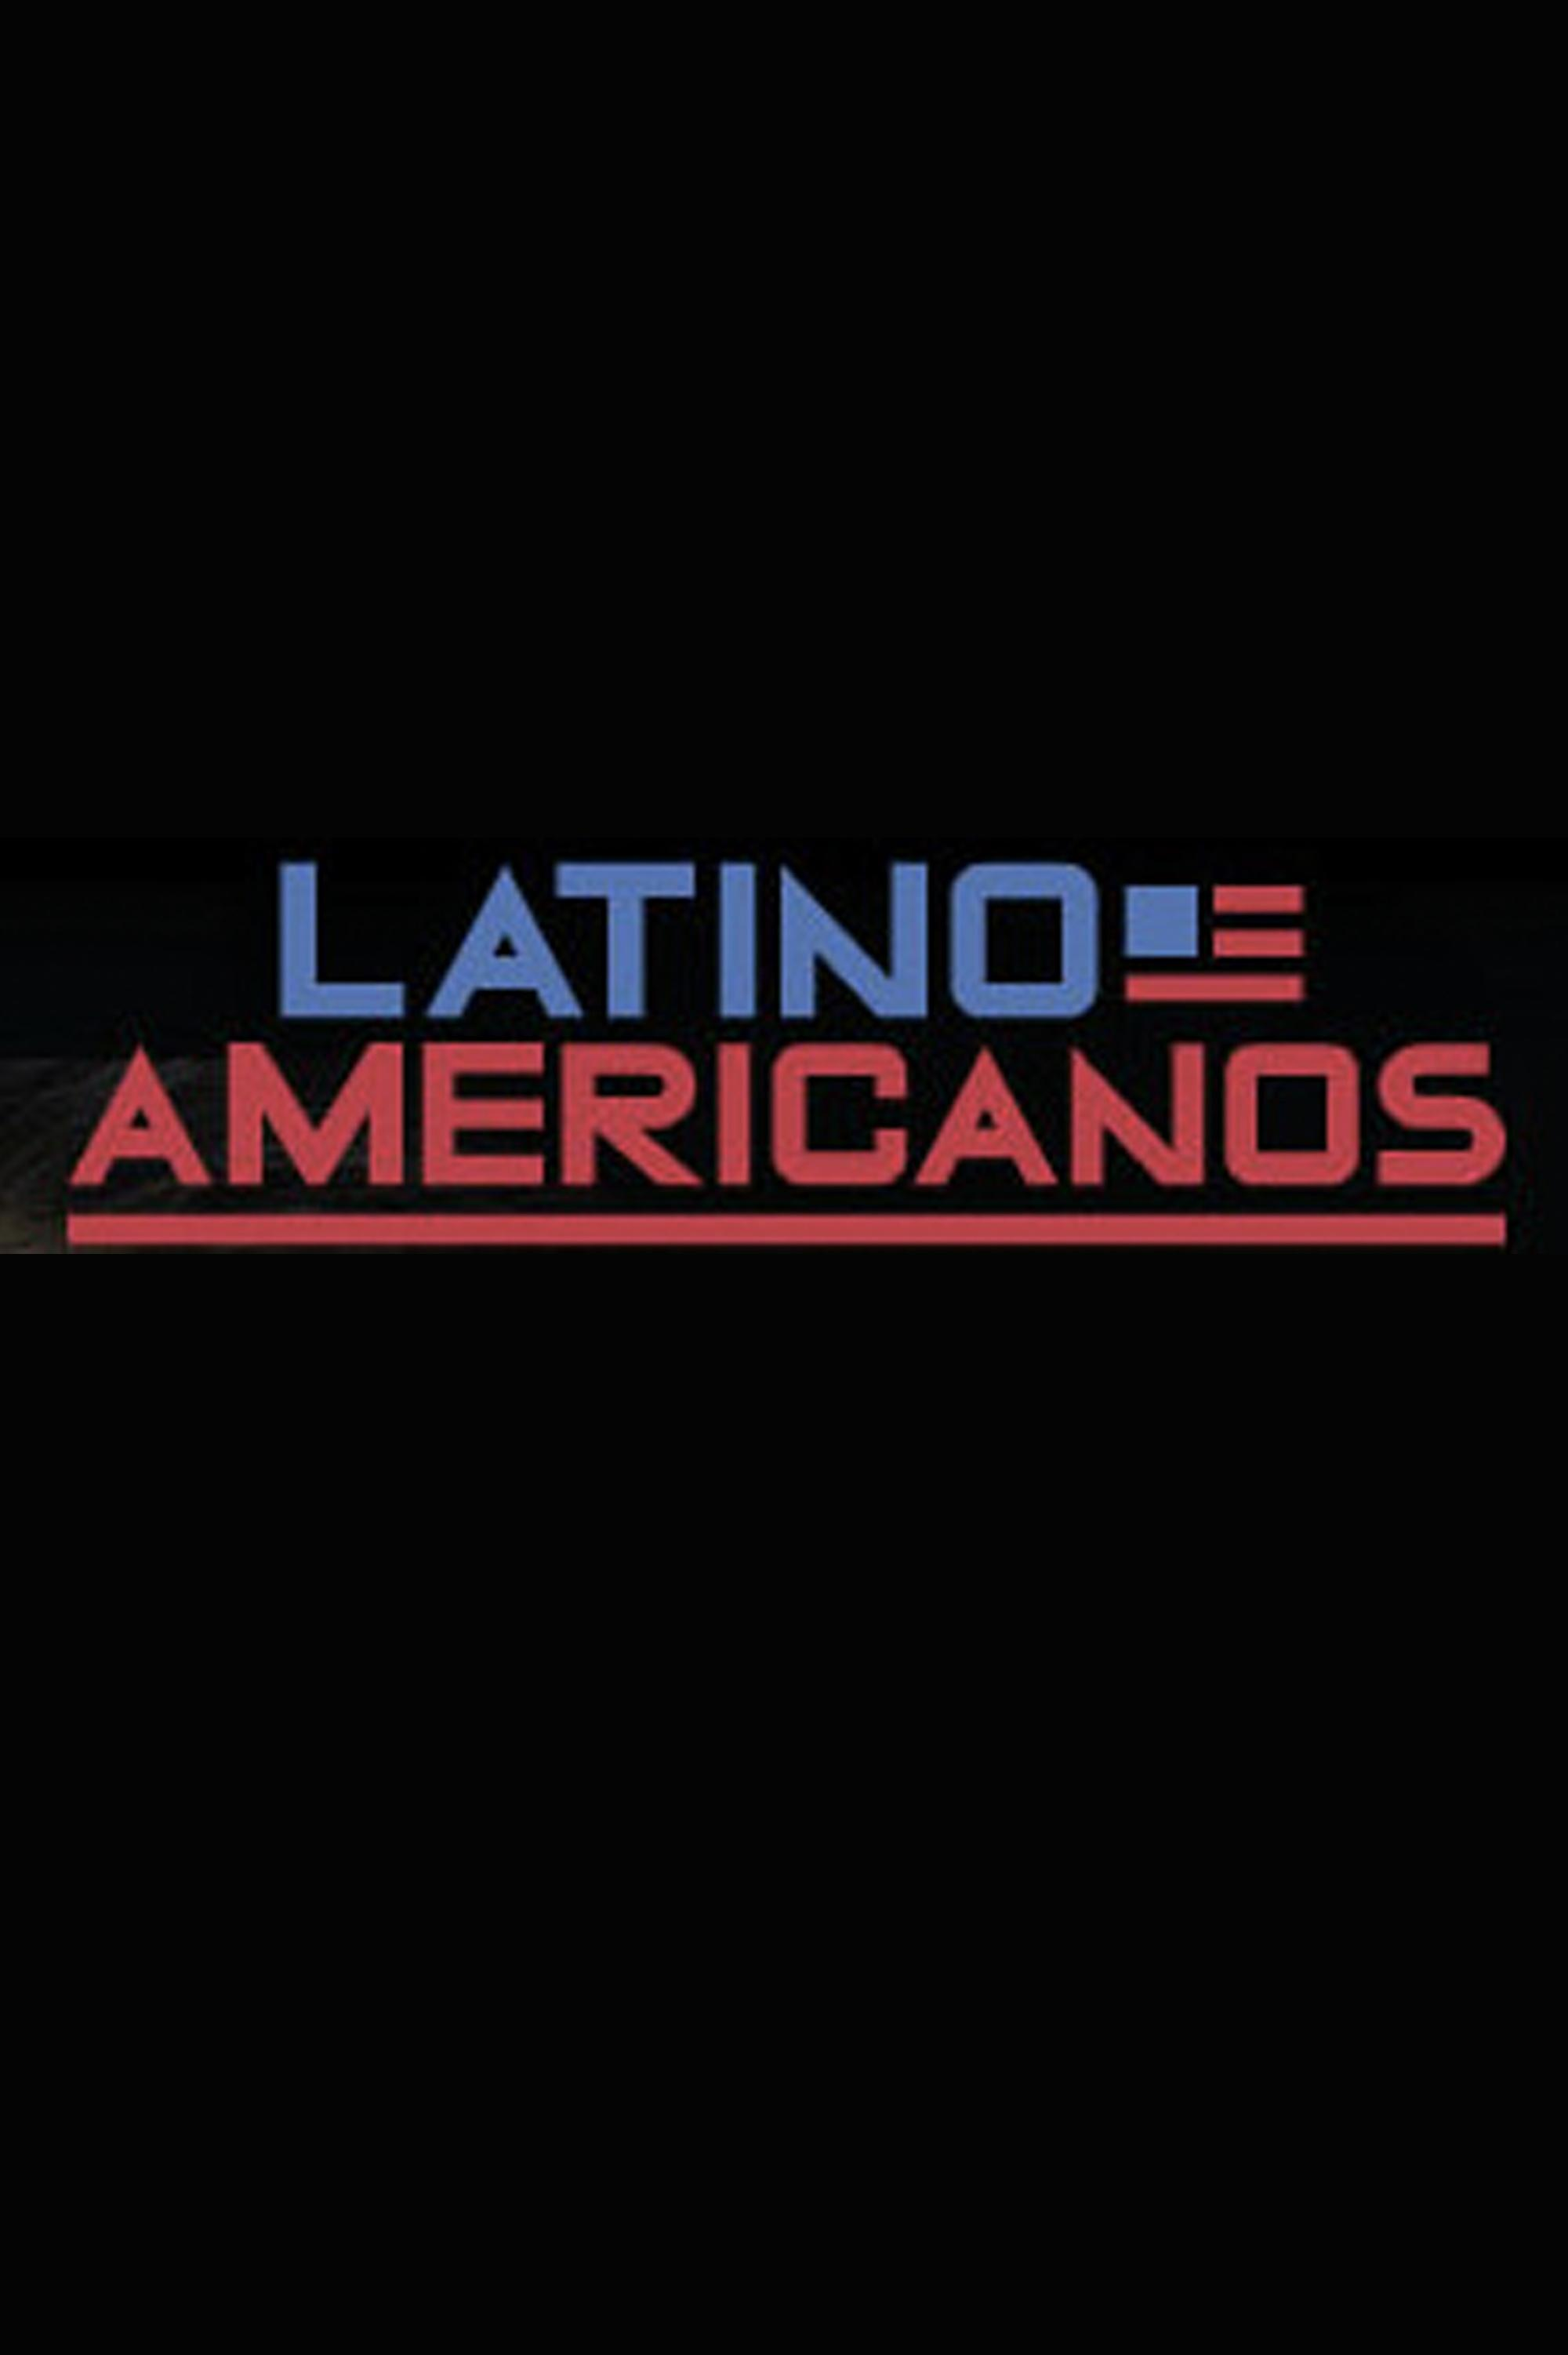 Latino Americanos on FREECABLE TV